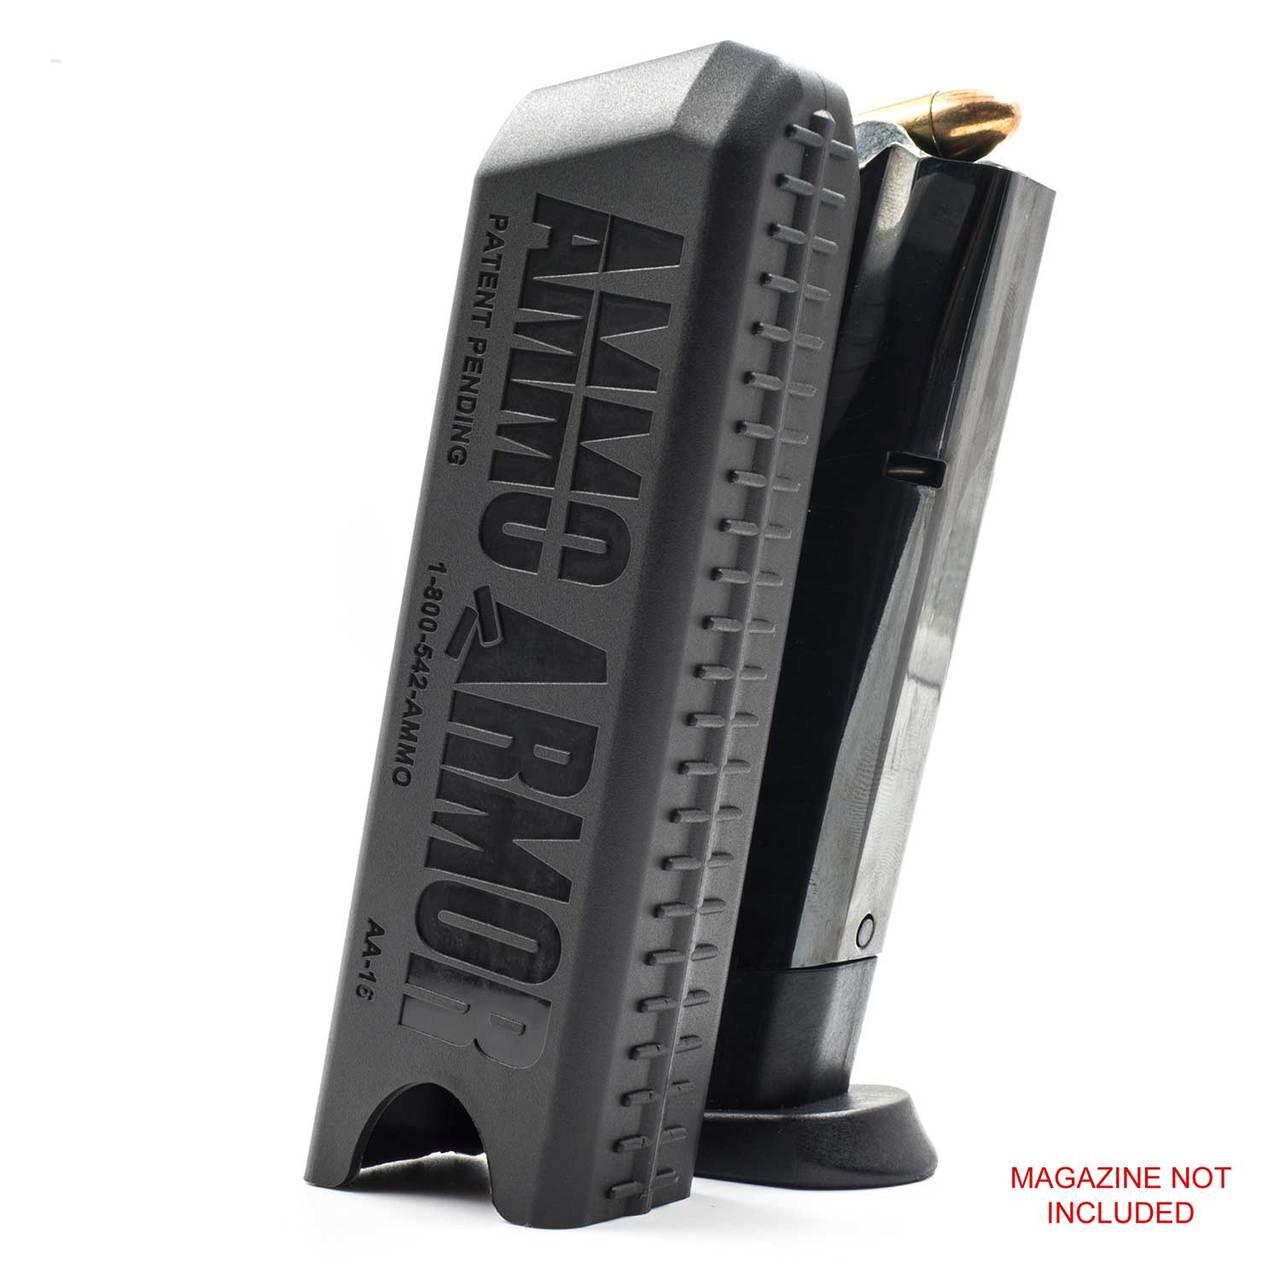 H&K P30 Magazine Protector